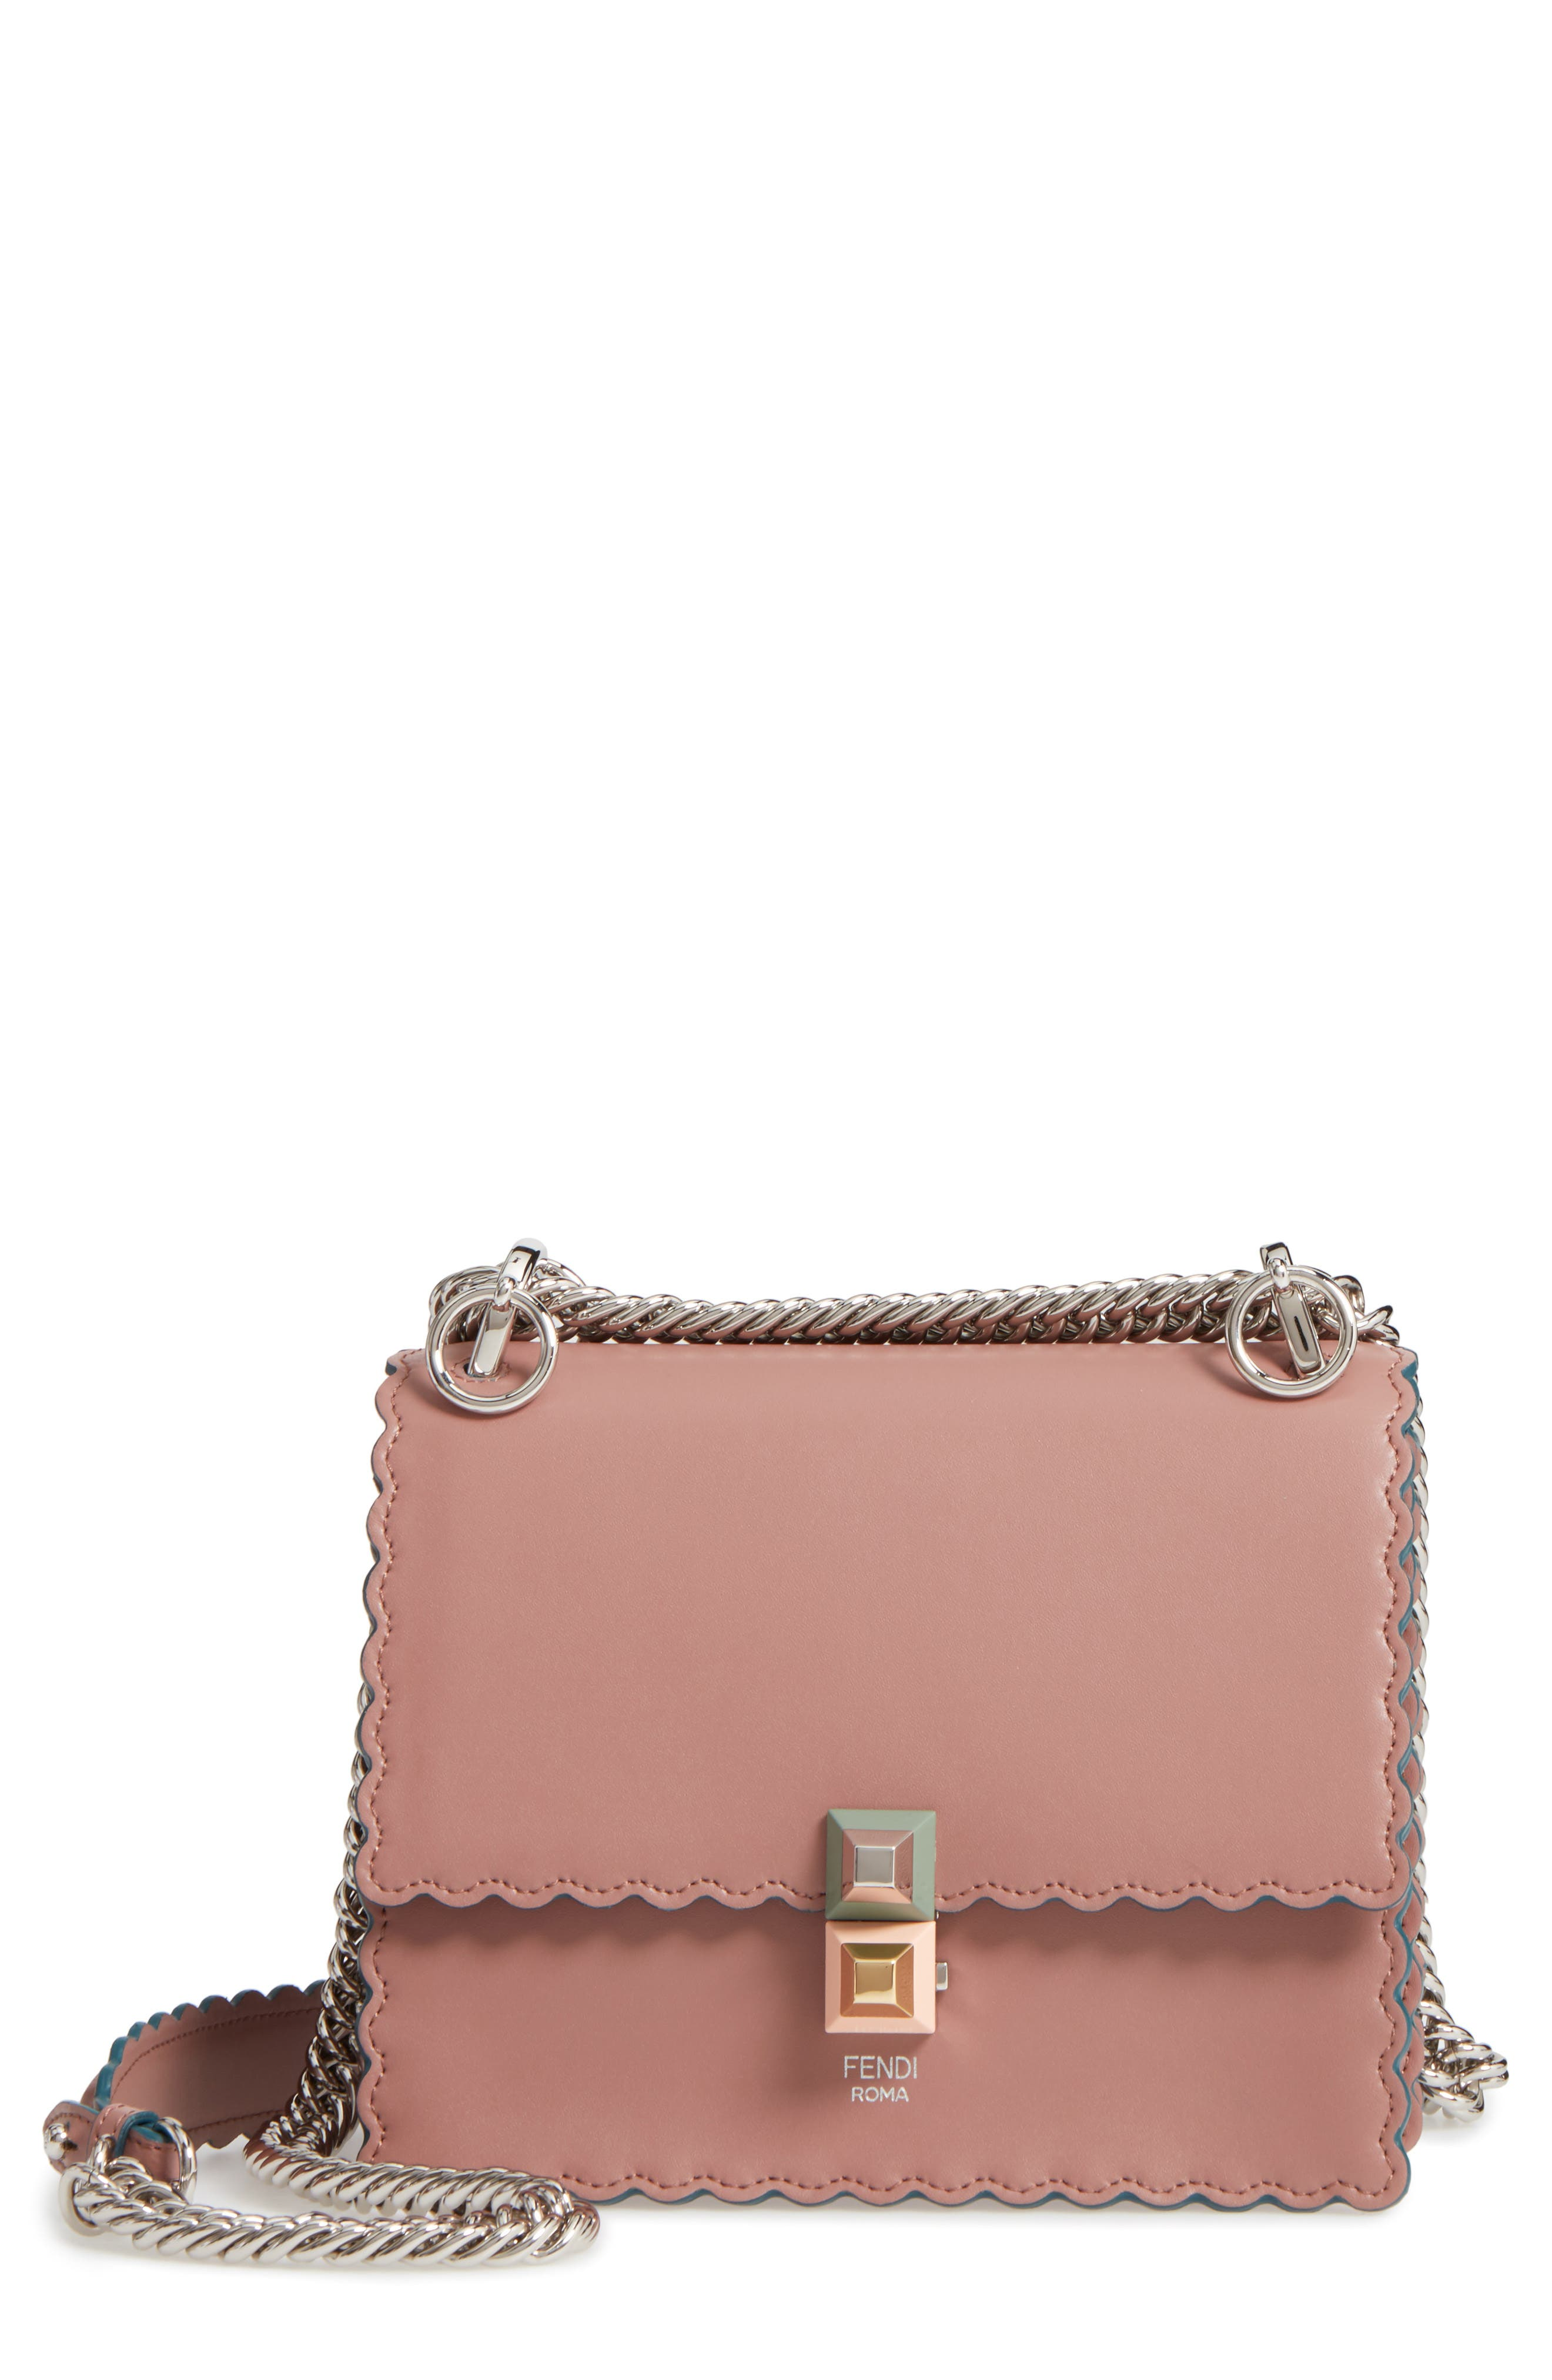 Small Kan I Scallop Leather Shoulder Bag,                             Main thumbnail 1, color,                             674